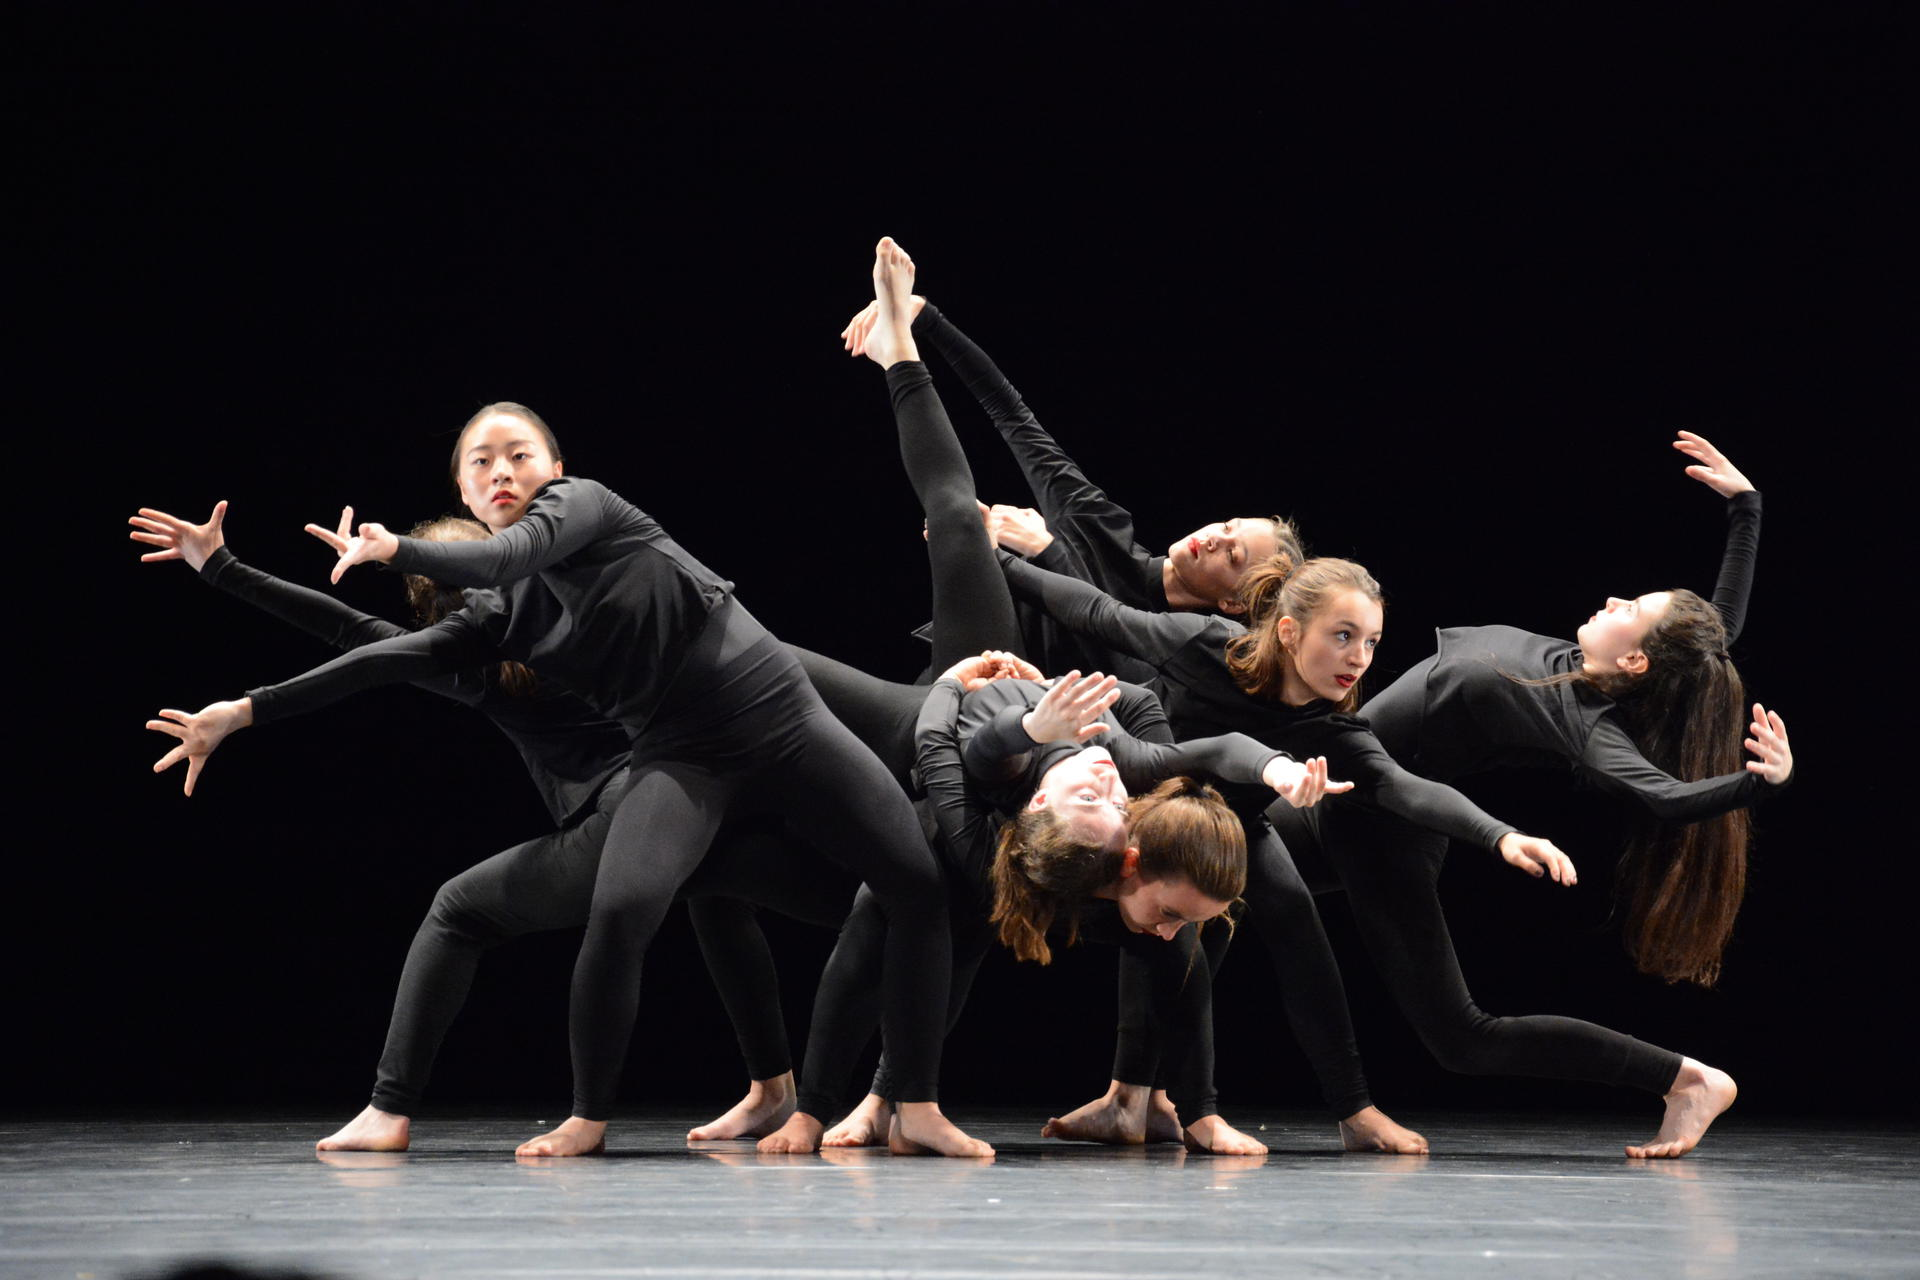 15768_863_180607-danse-mc2-groupe-contemporain